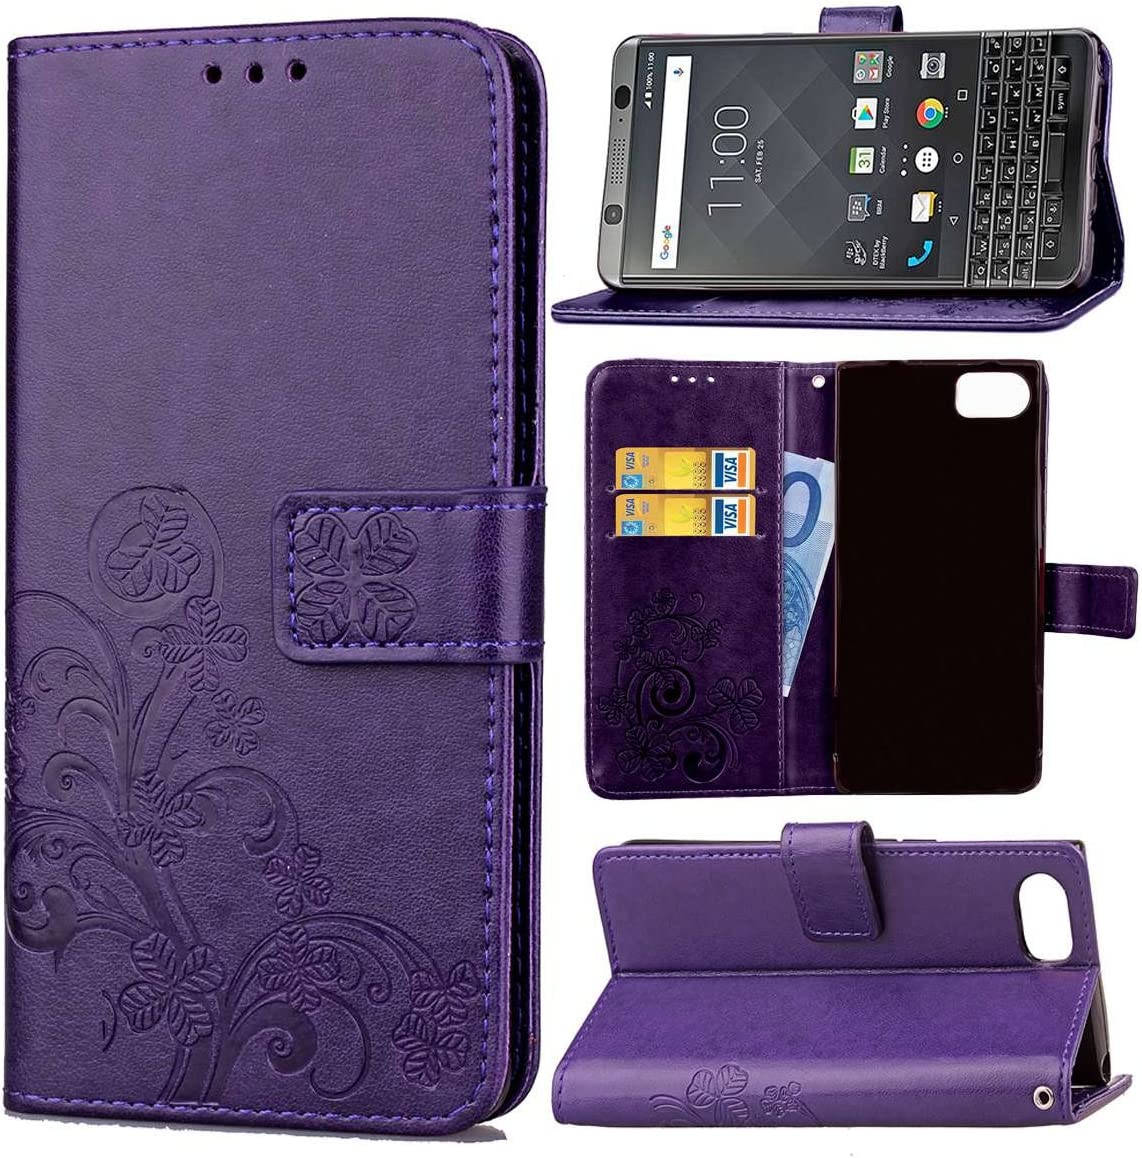 Guran® Funda de Cuero PU para Blackberry Keyone / Mercury ...